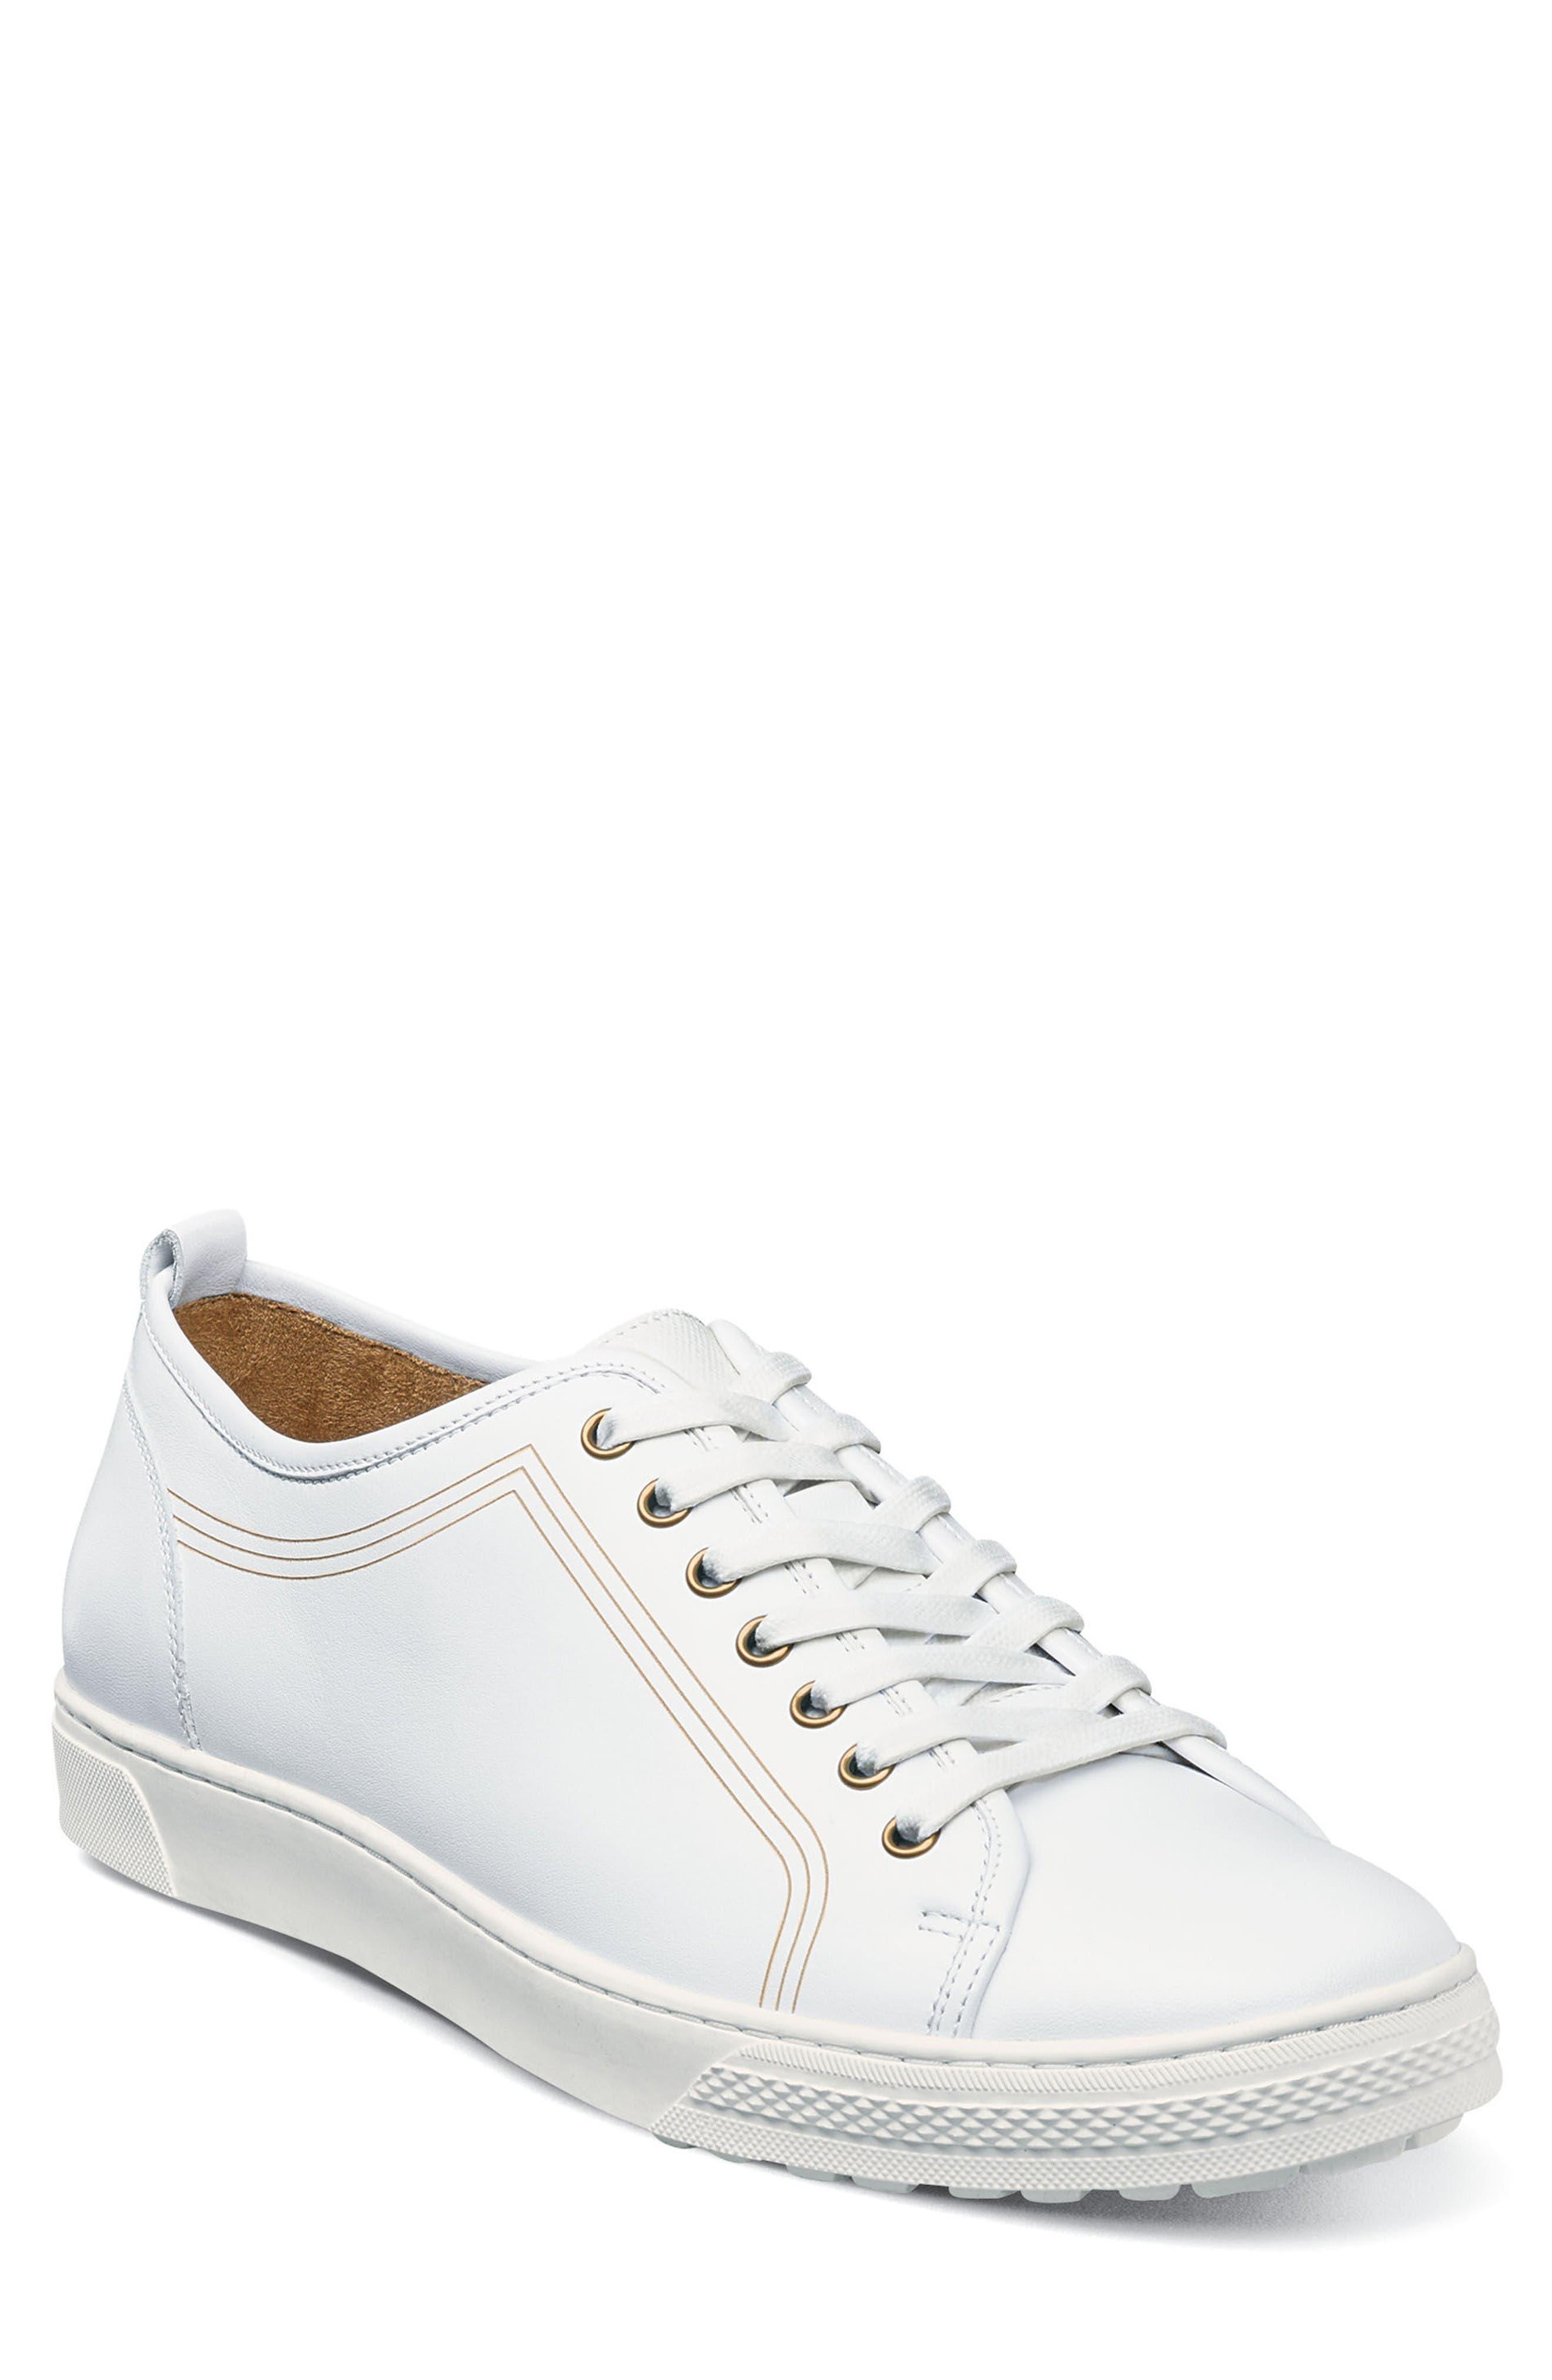 Forward Lo Sneaker,                         Main,                         color, White Leather